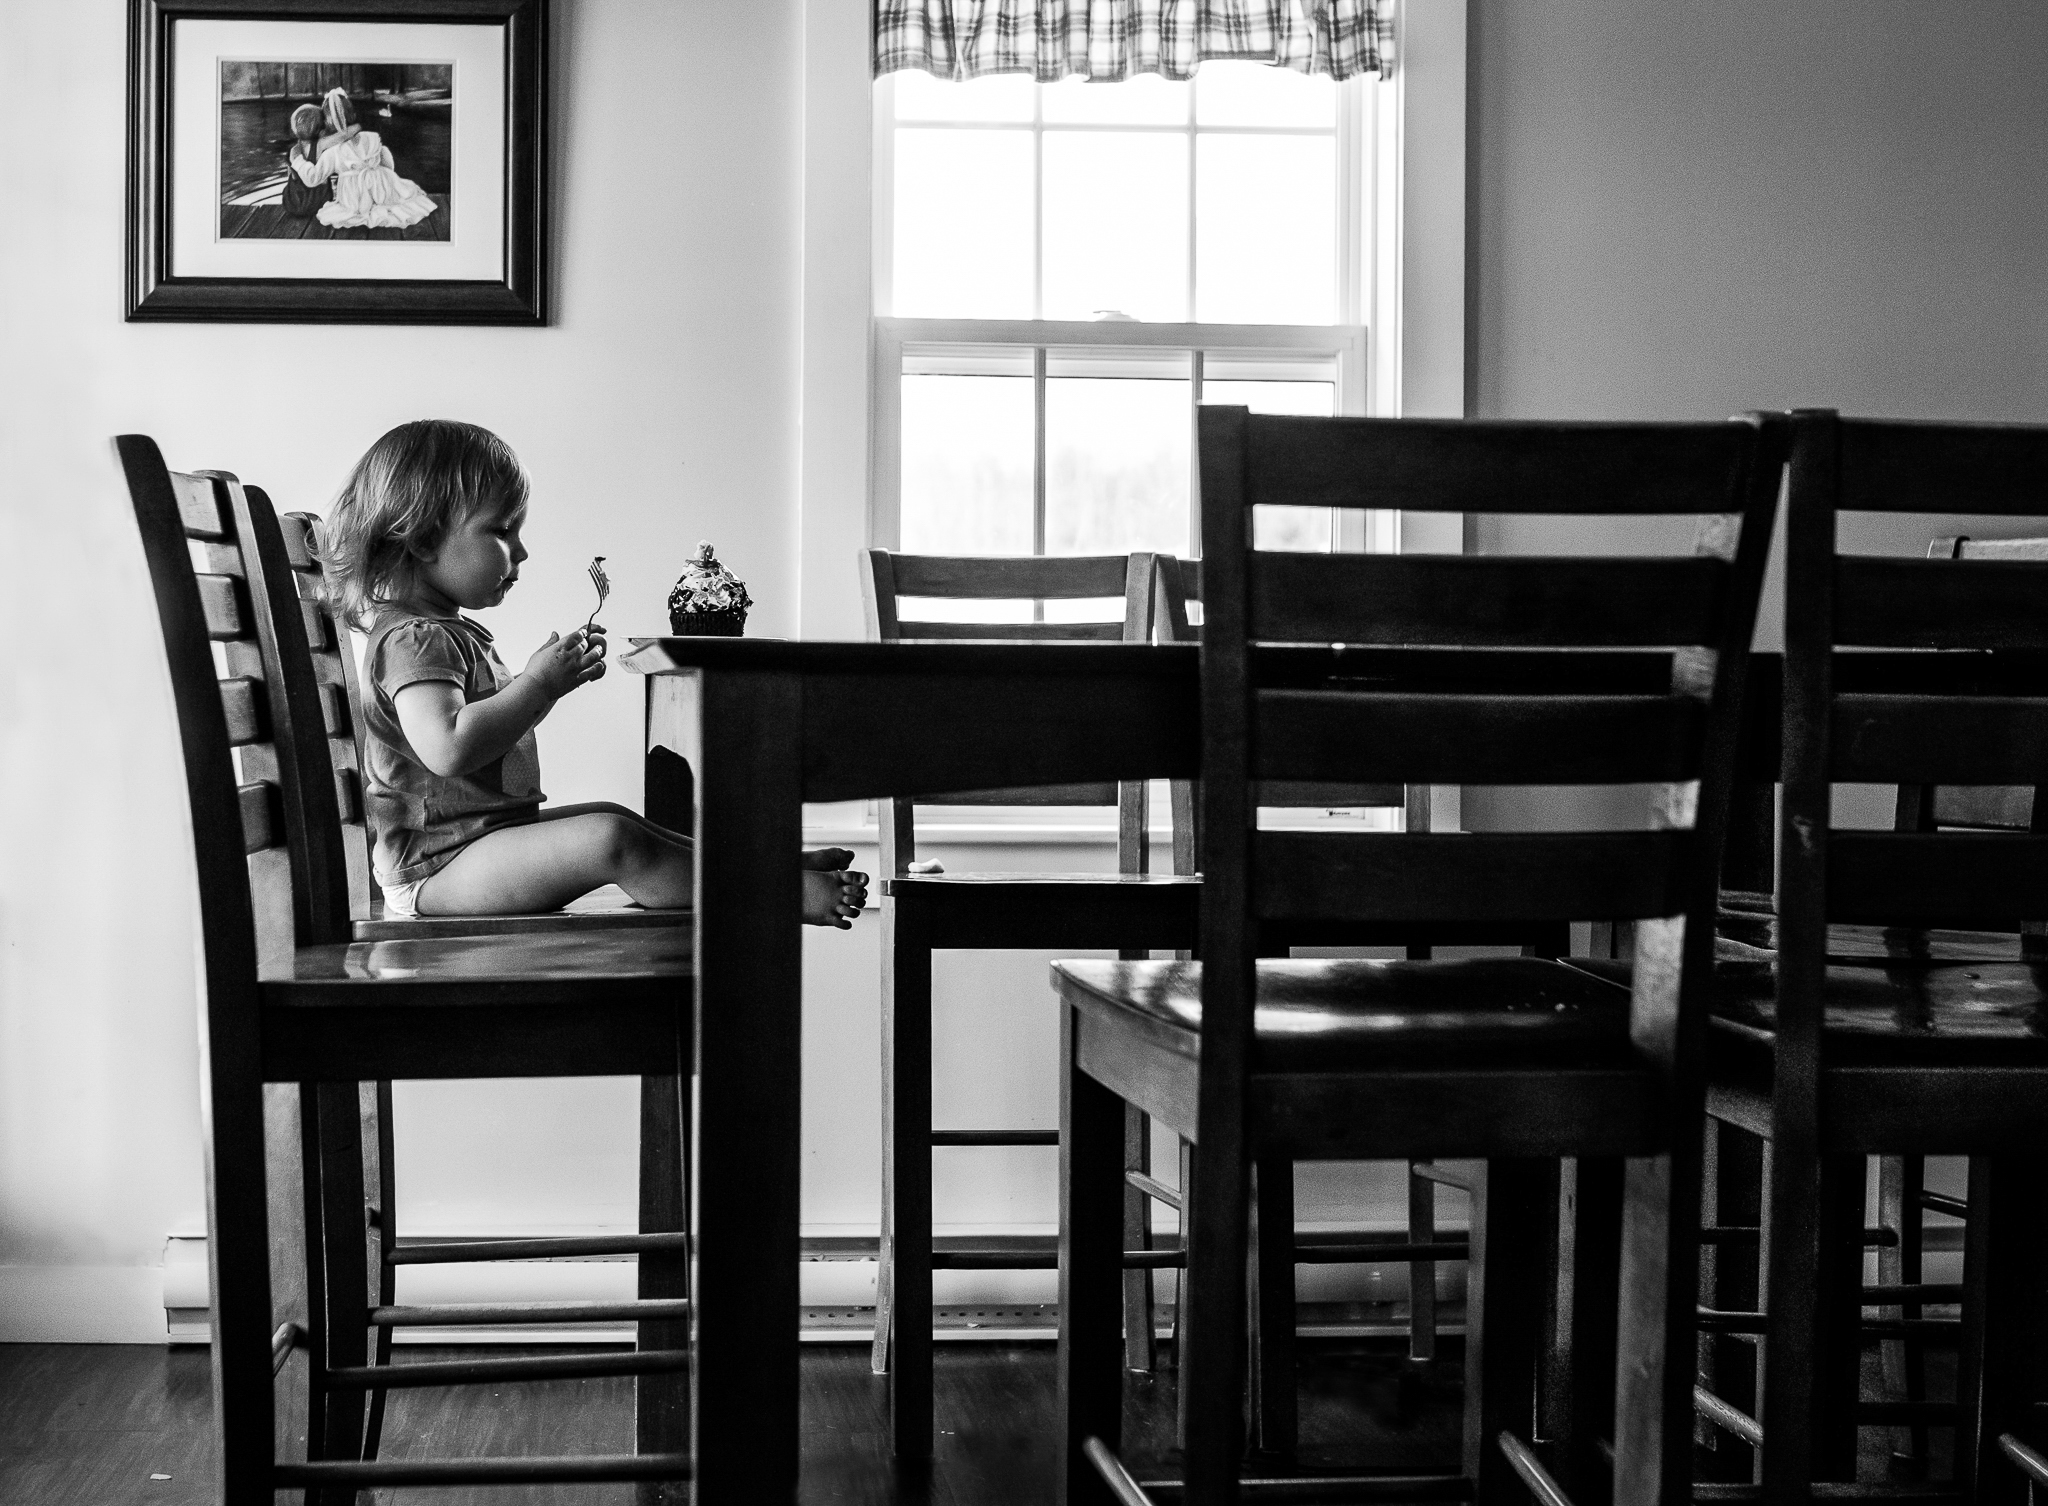 Moncton, NB Photographer Tara Geldart